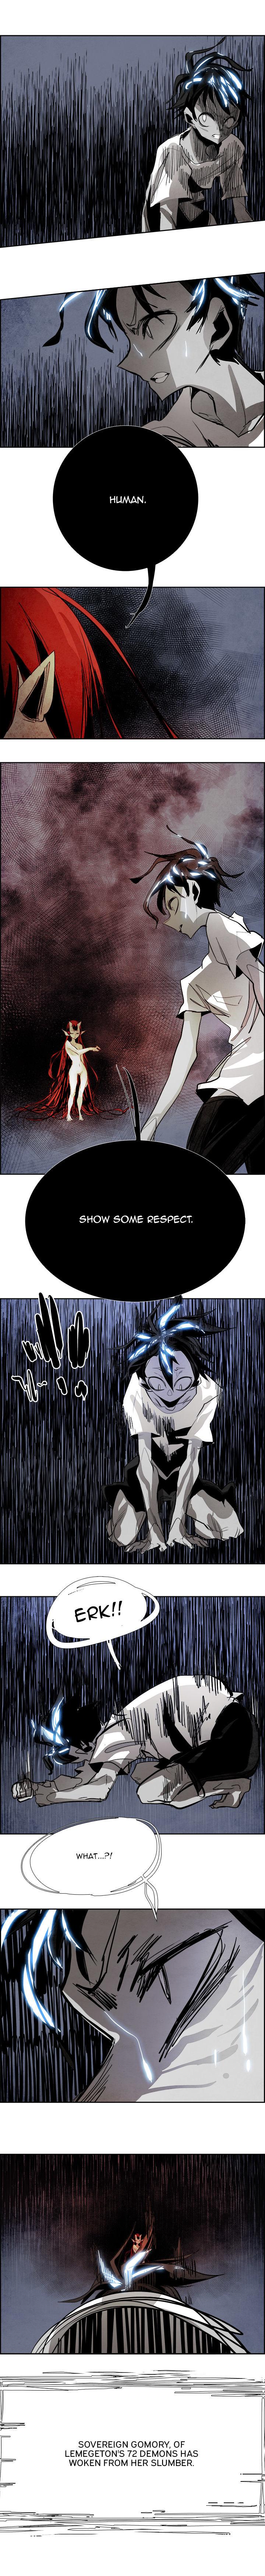 https://img2.nineanime.com/comics/pic2/26/27994/718367/e7825aa77d58d1549cc352fc44fe114c.jpg Page 1